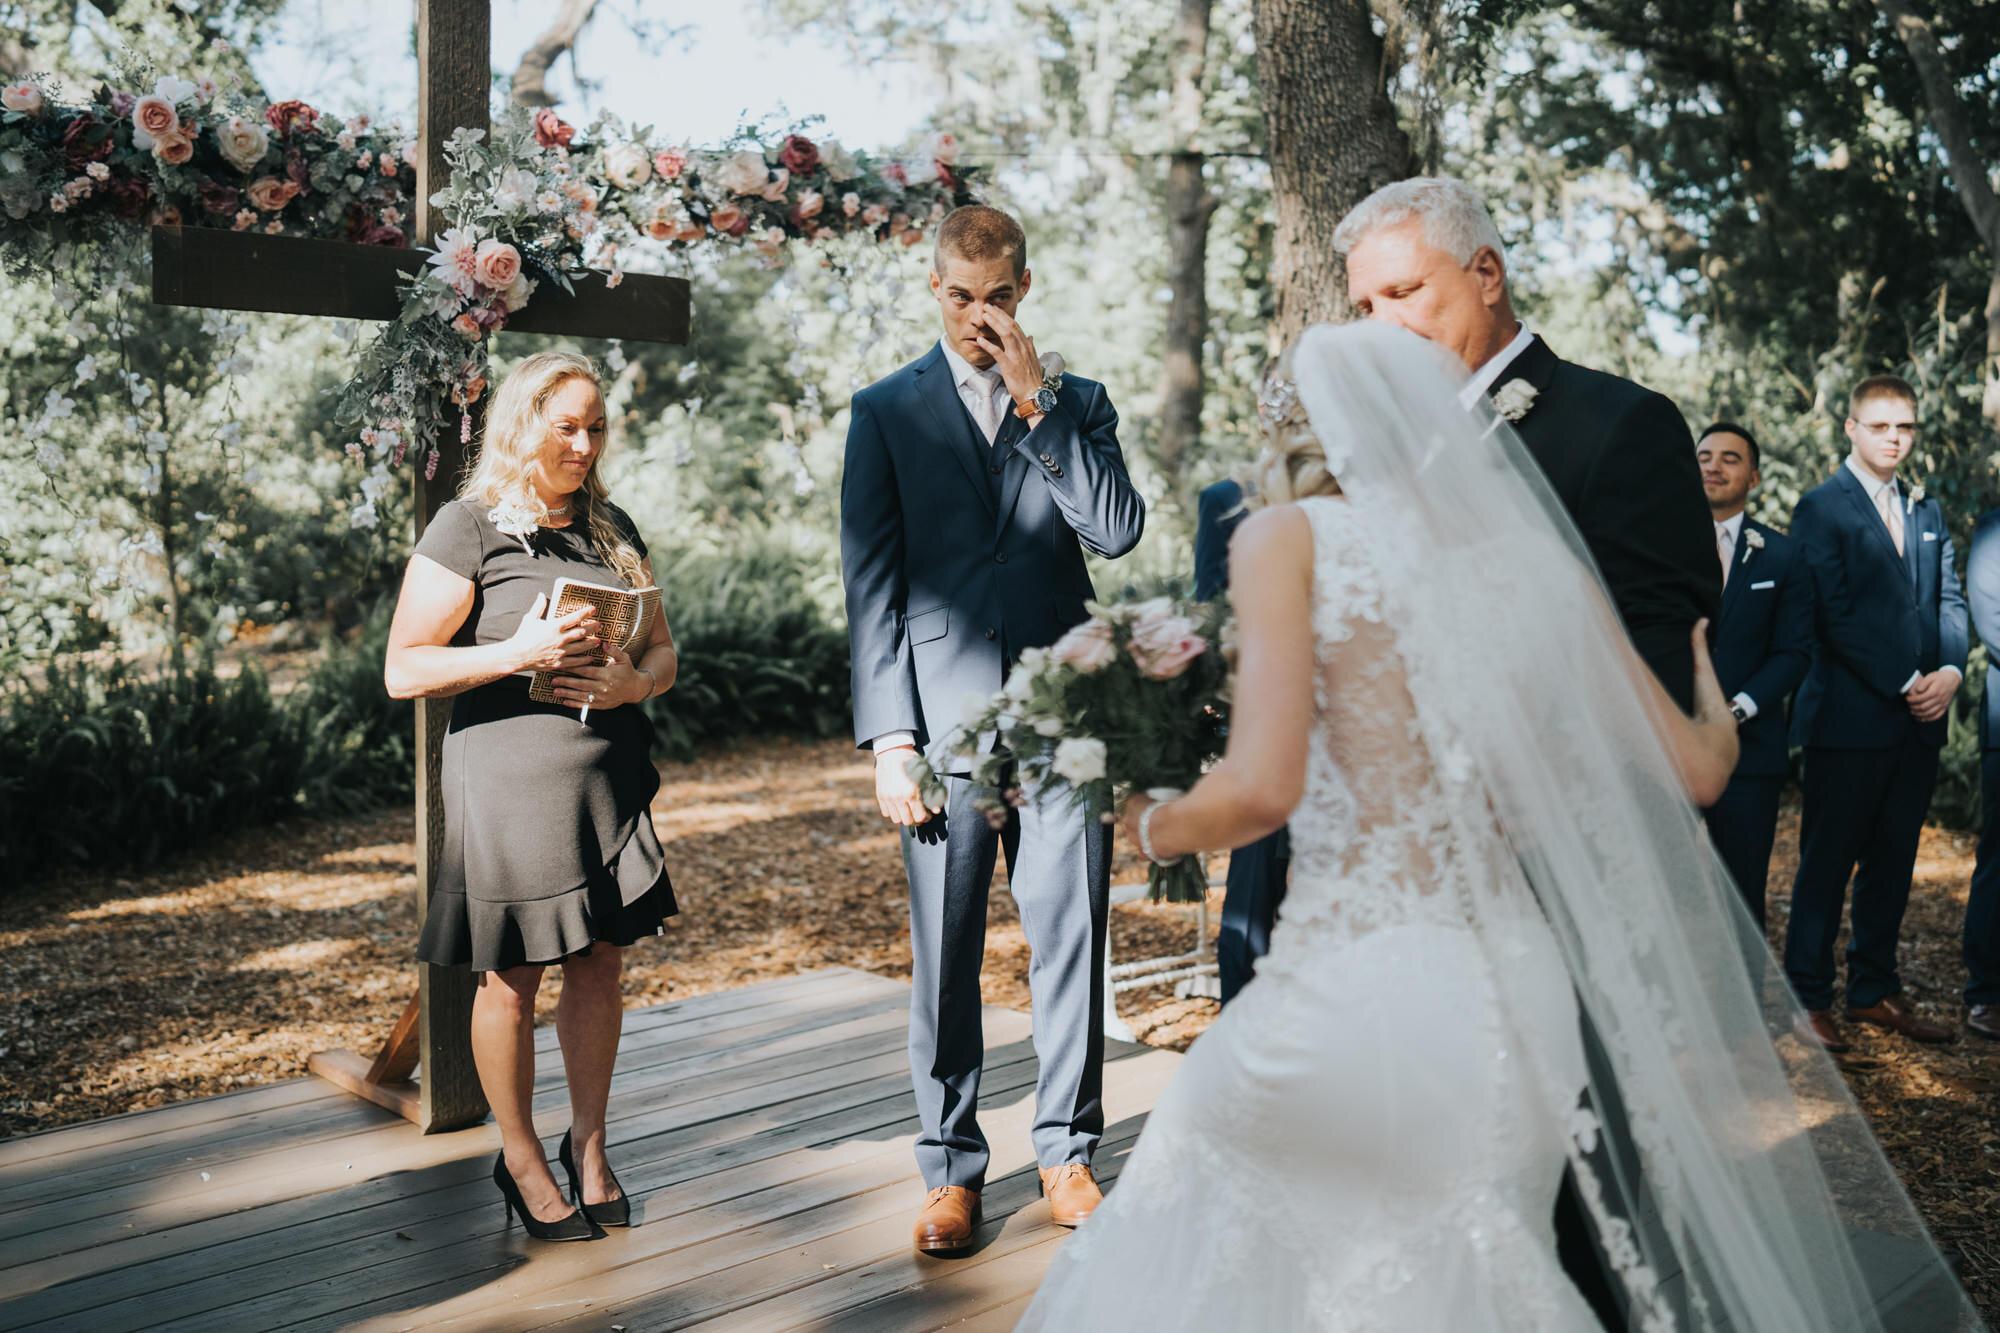 232Sean_Emily_Wedding_3-30-19.jpg